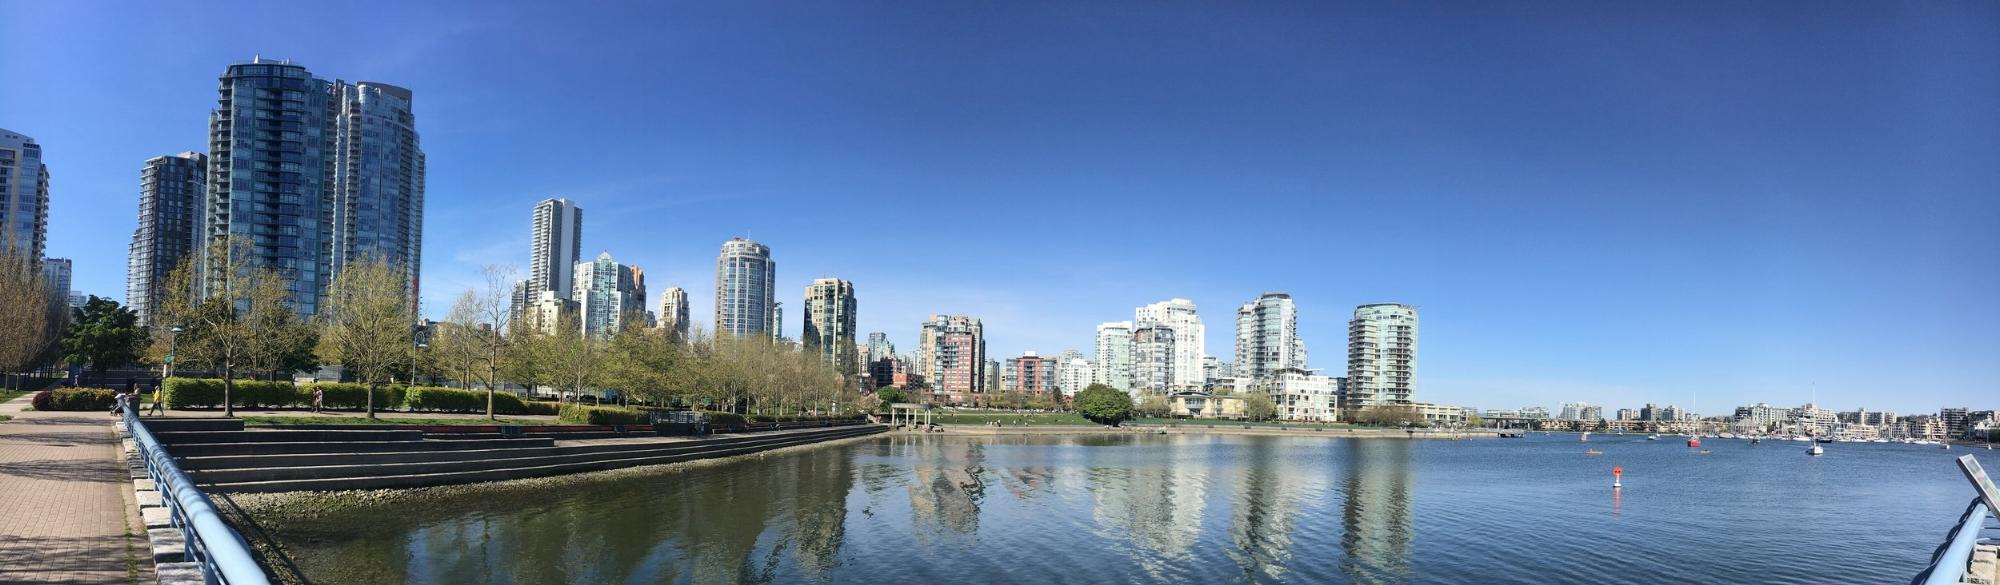 Photo taken by Darren Henry April 25, 2018 in Vancouver